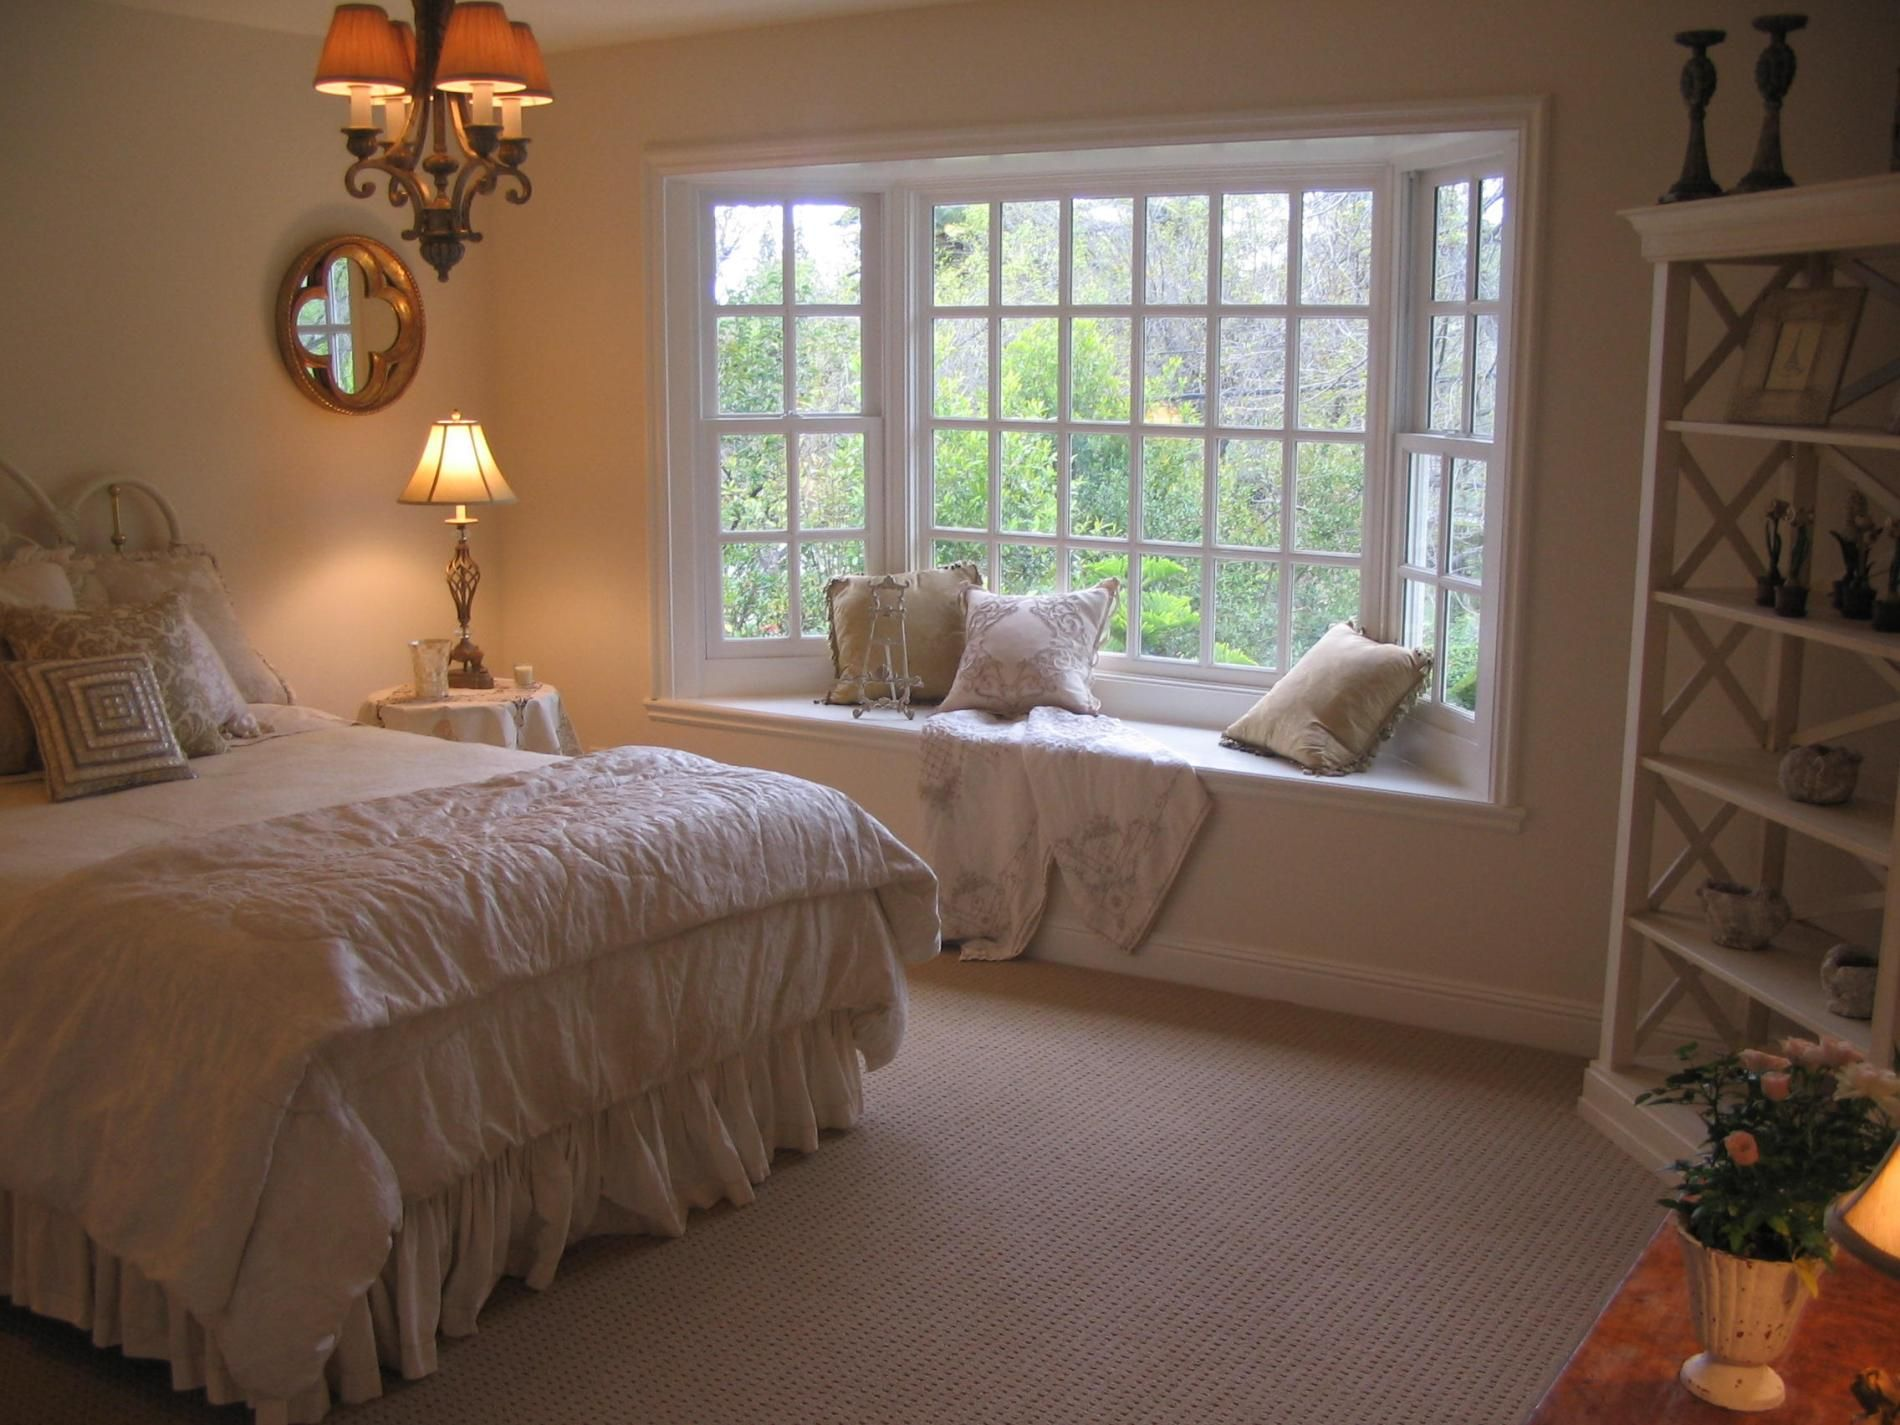 Apartment Bedroom Decorating Bay Windows On Decoration Category Interior  Design In Small Loft Area Contemporary Regarding Window.